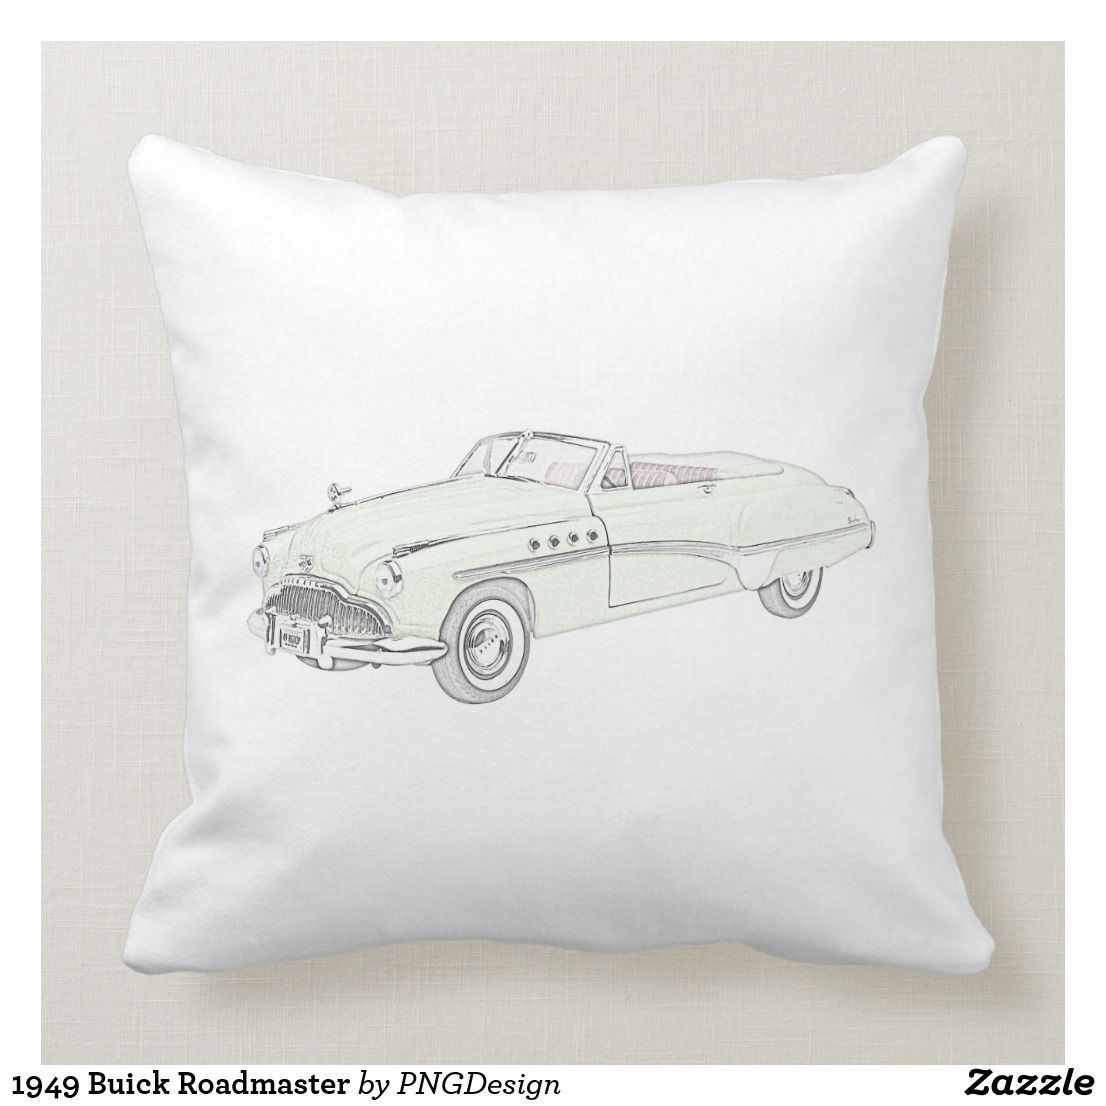 1949 Buick Roadmaster Throw Pillow Pillows Throw Pillows